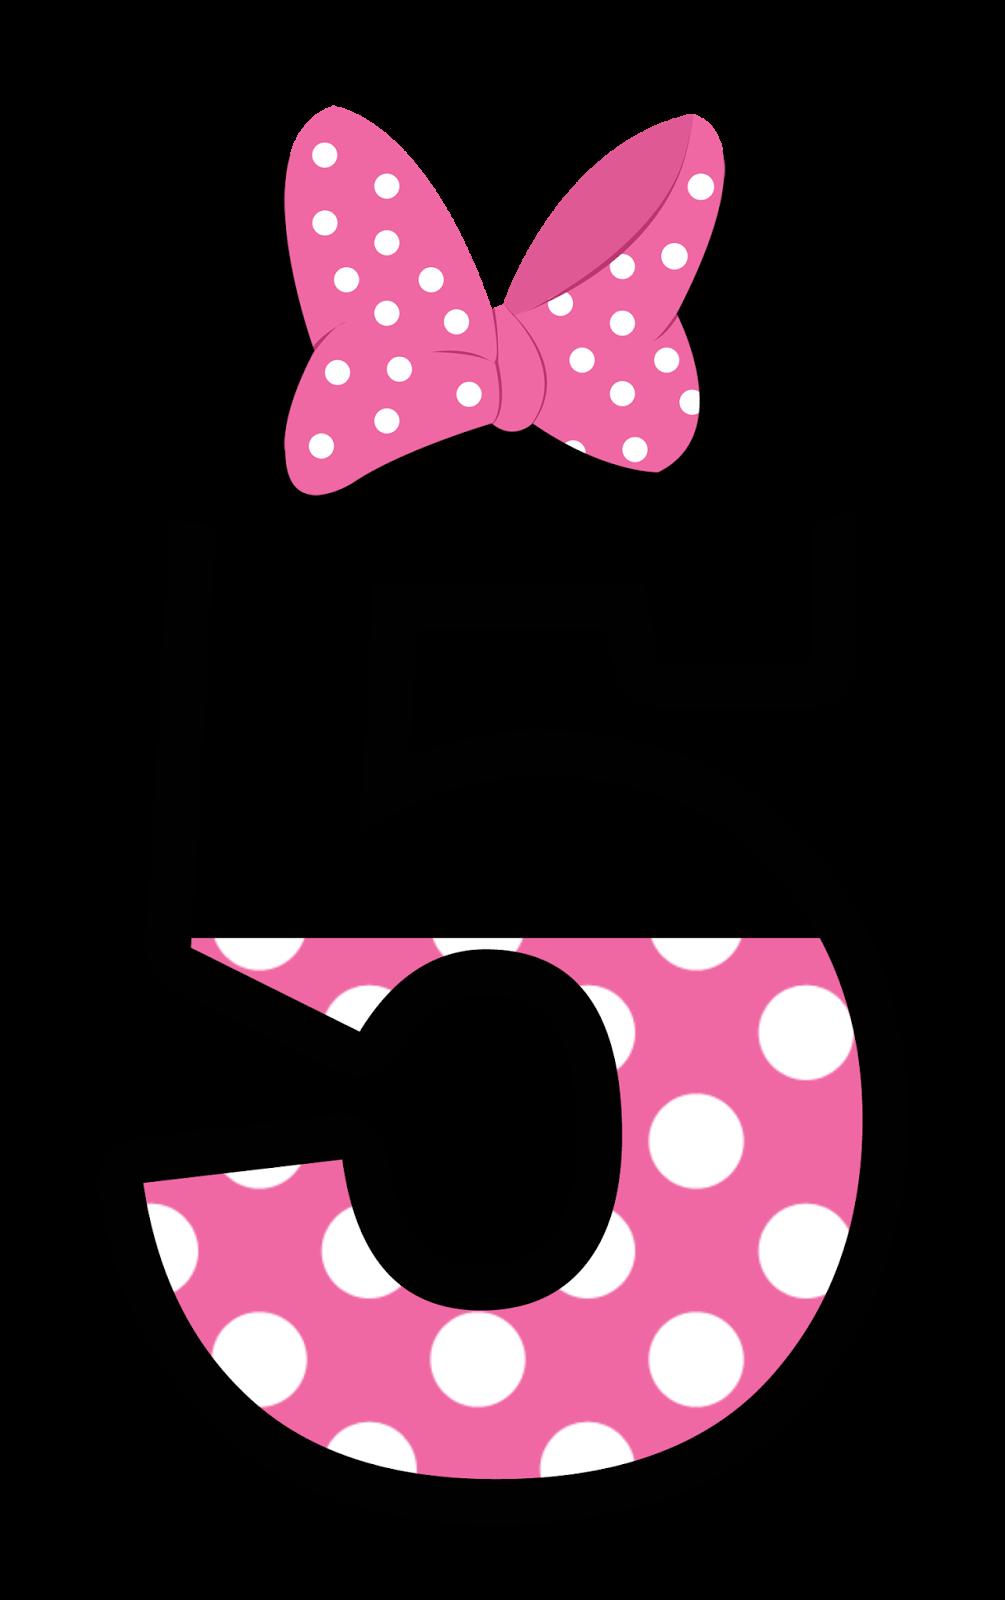 Halloween clipart minnie. Numeros estilo en rosa